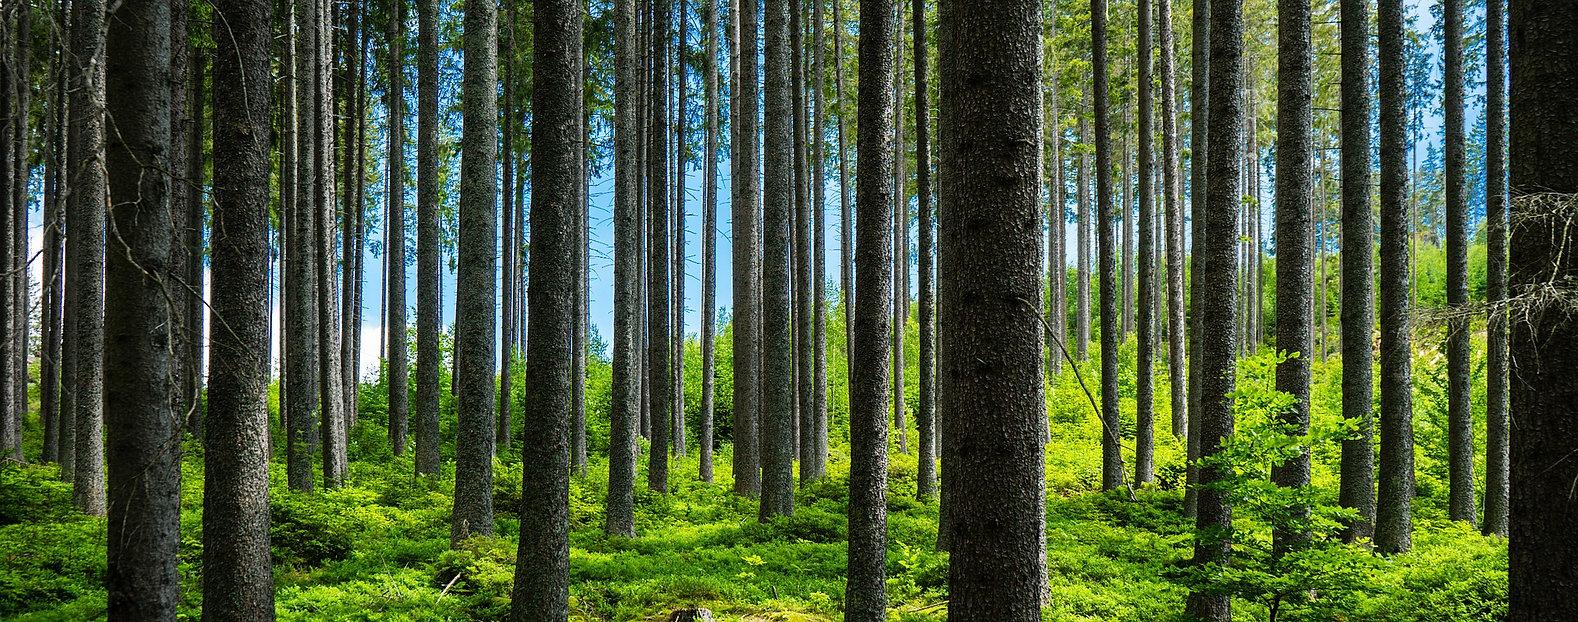 forest-5323328_1920.jpg